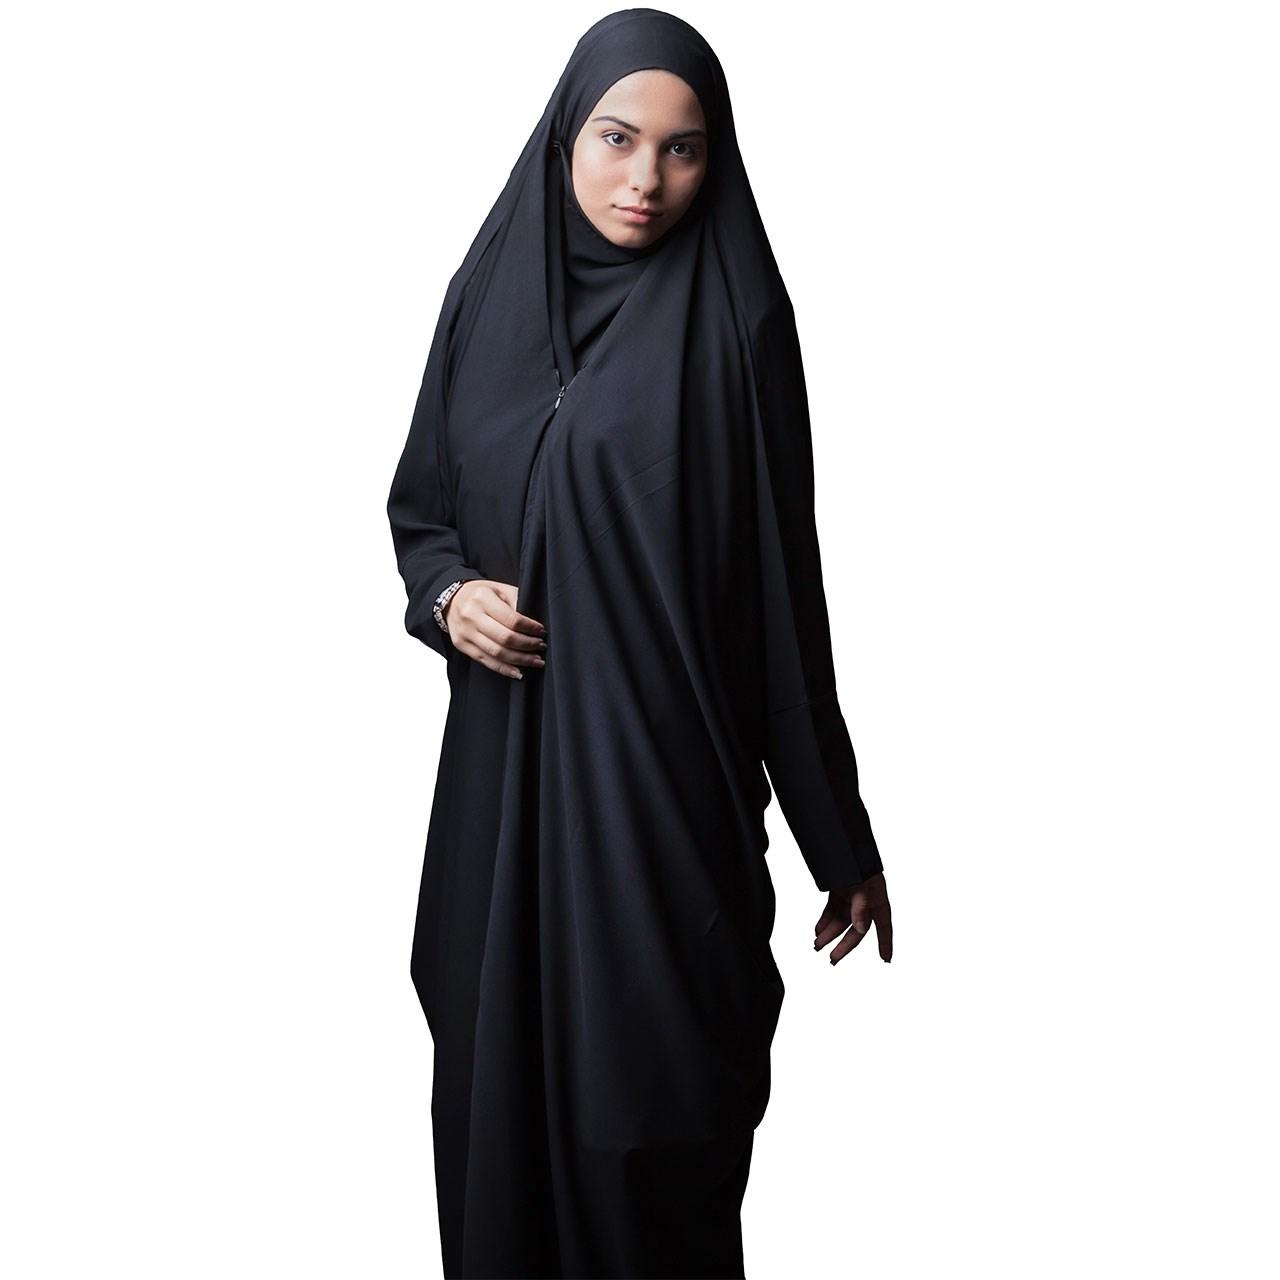 چادر لبنانی کریستال حجاب فاطمی مدل 201052kr